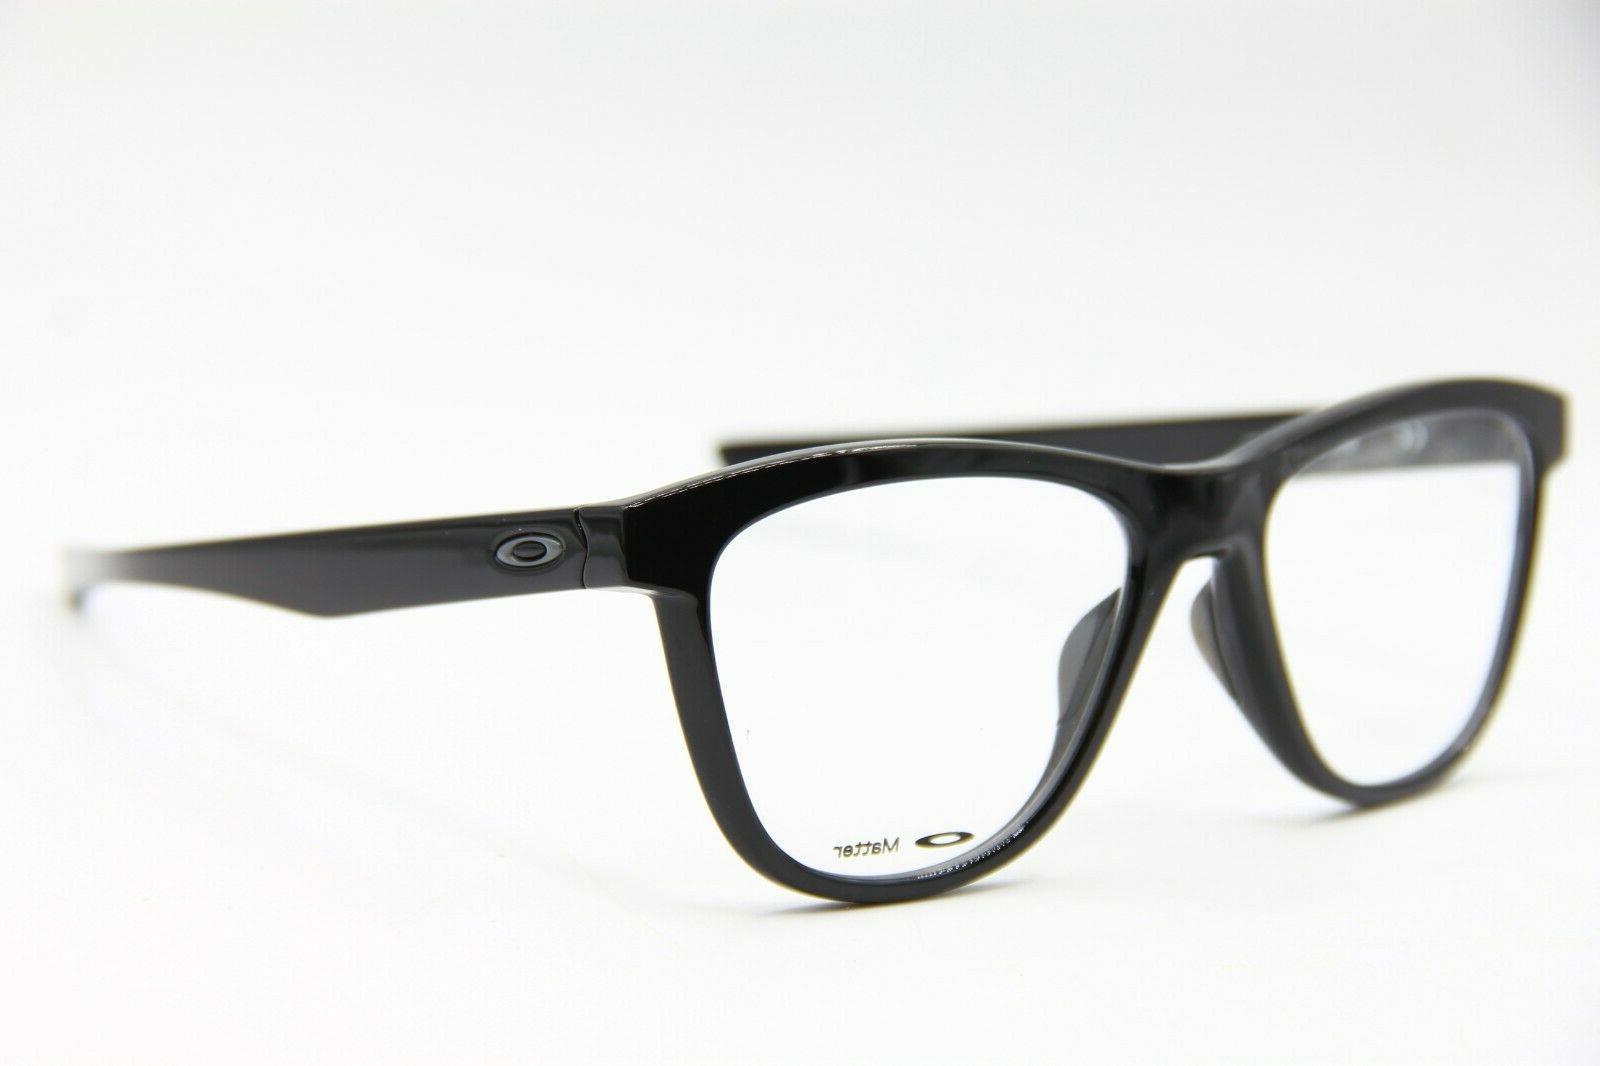 new ox8070 0153 black grounded authentic eyeglasses